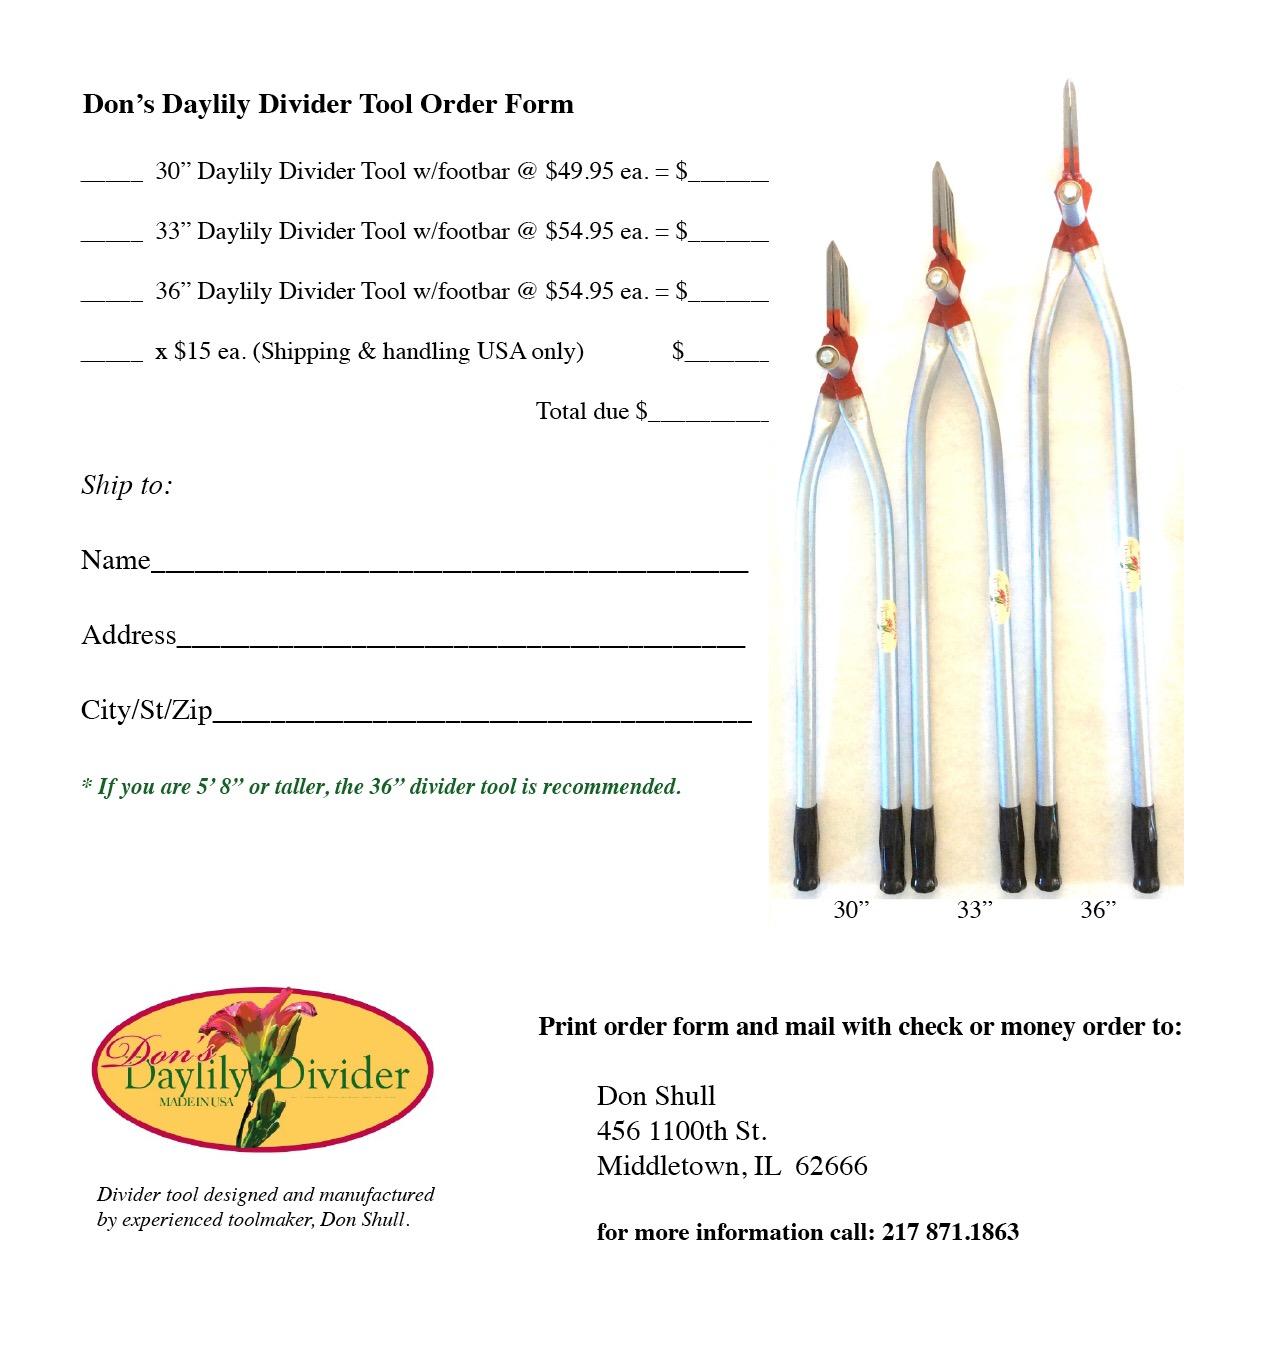 Printable Order Form   Don's Daylily Divider